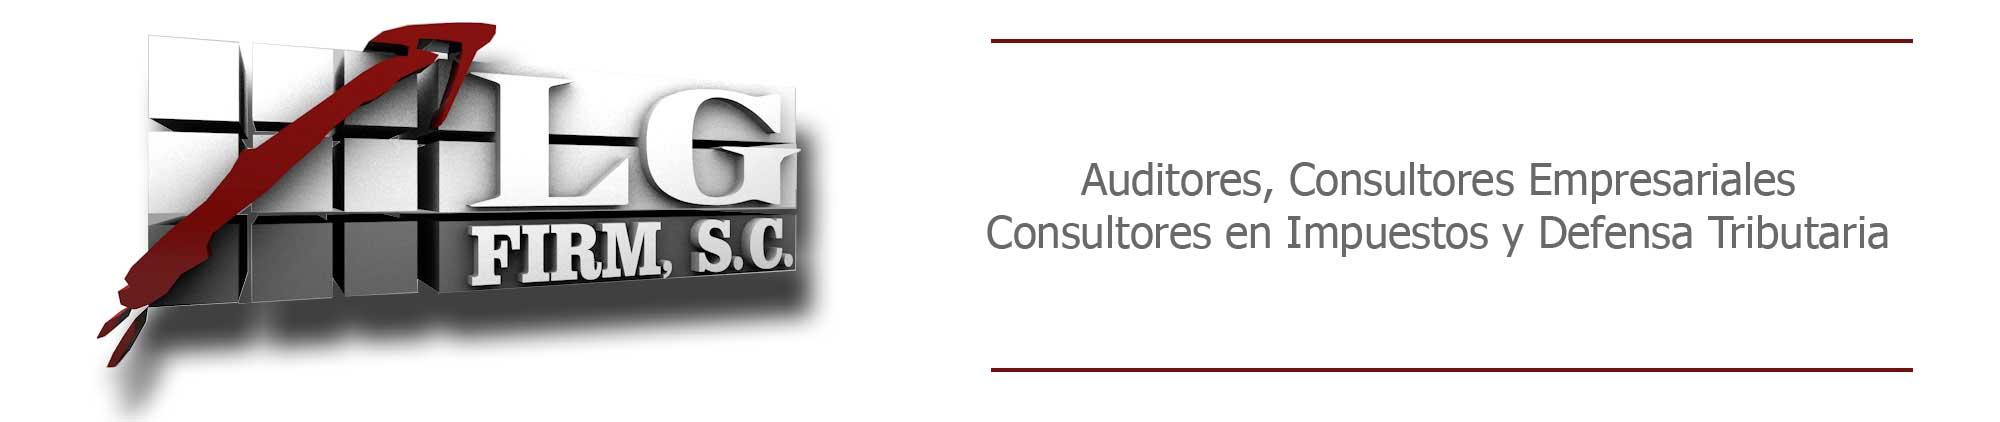 LG Firm - Asesoría Tributaria Guatemala